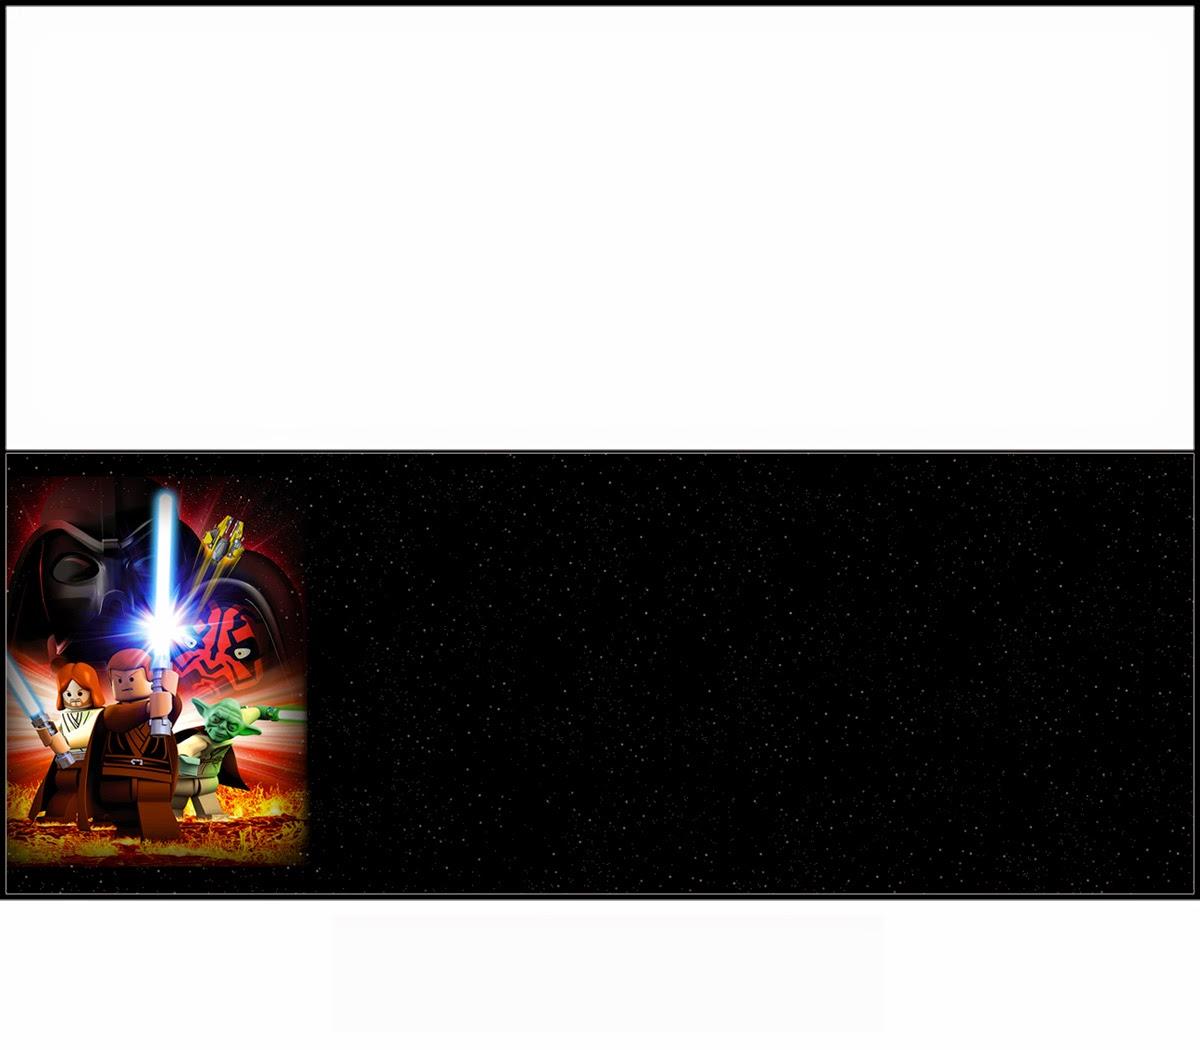 Encantador Guerras Clon De Lego Star Wars Para Colorear Imprimibles ...